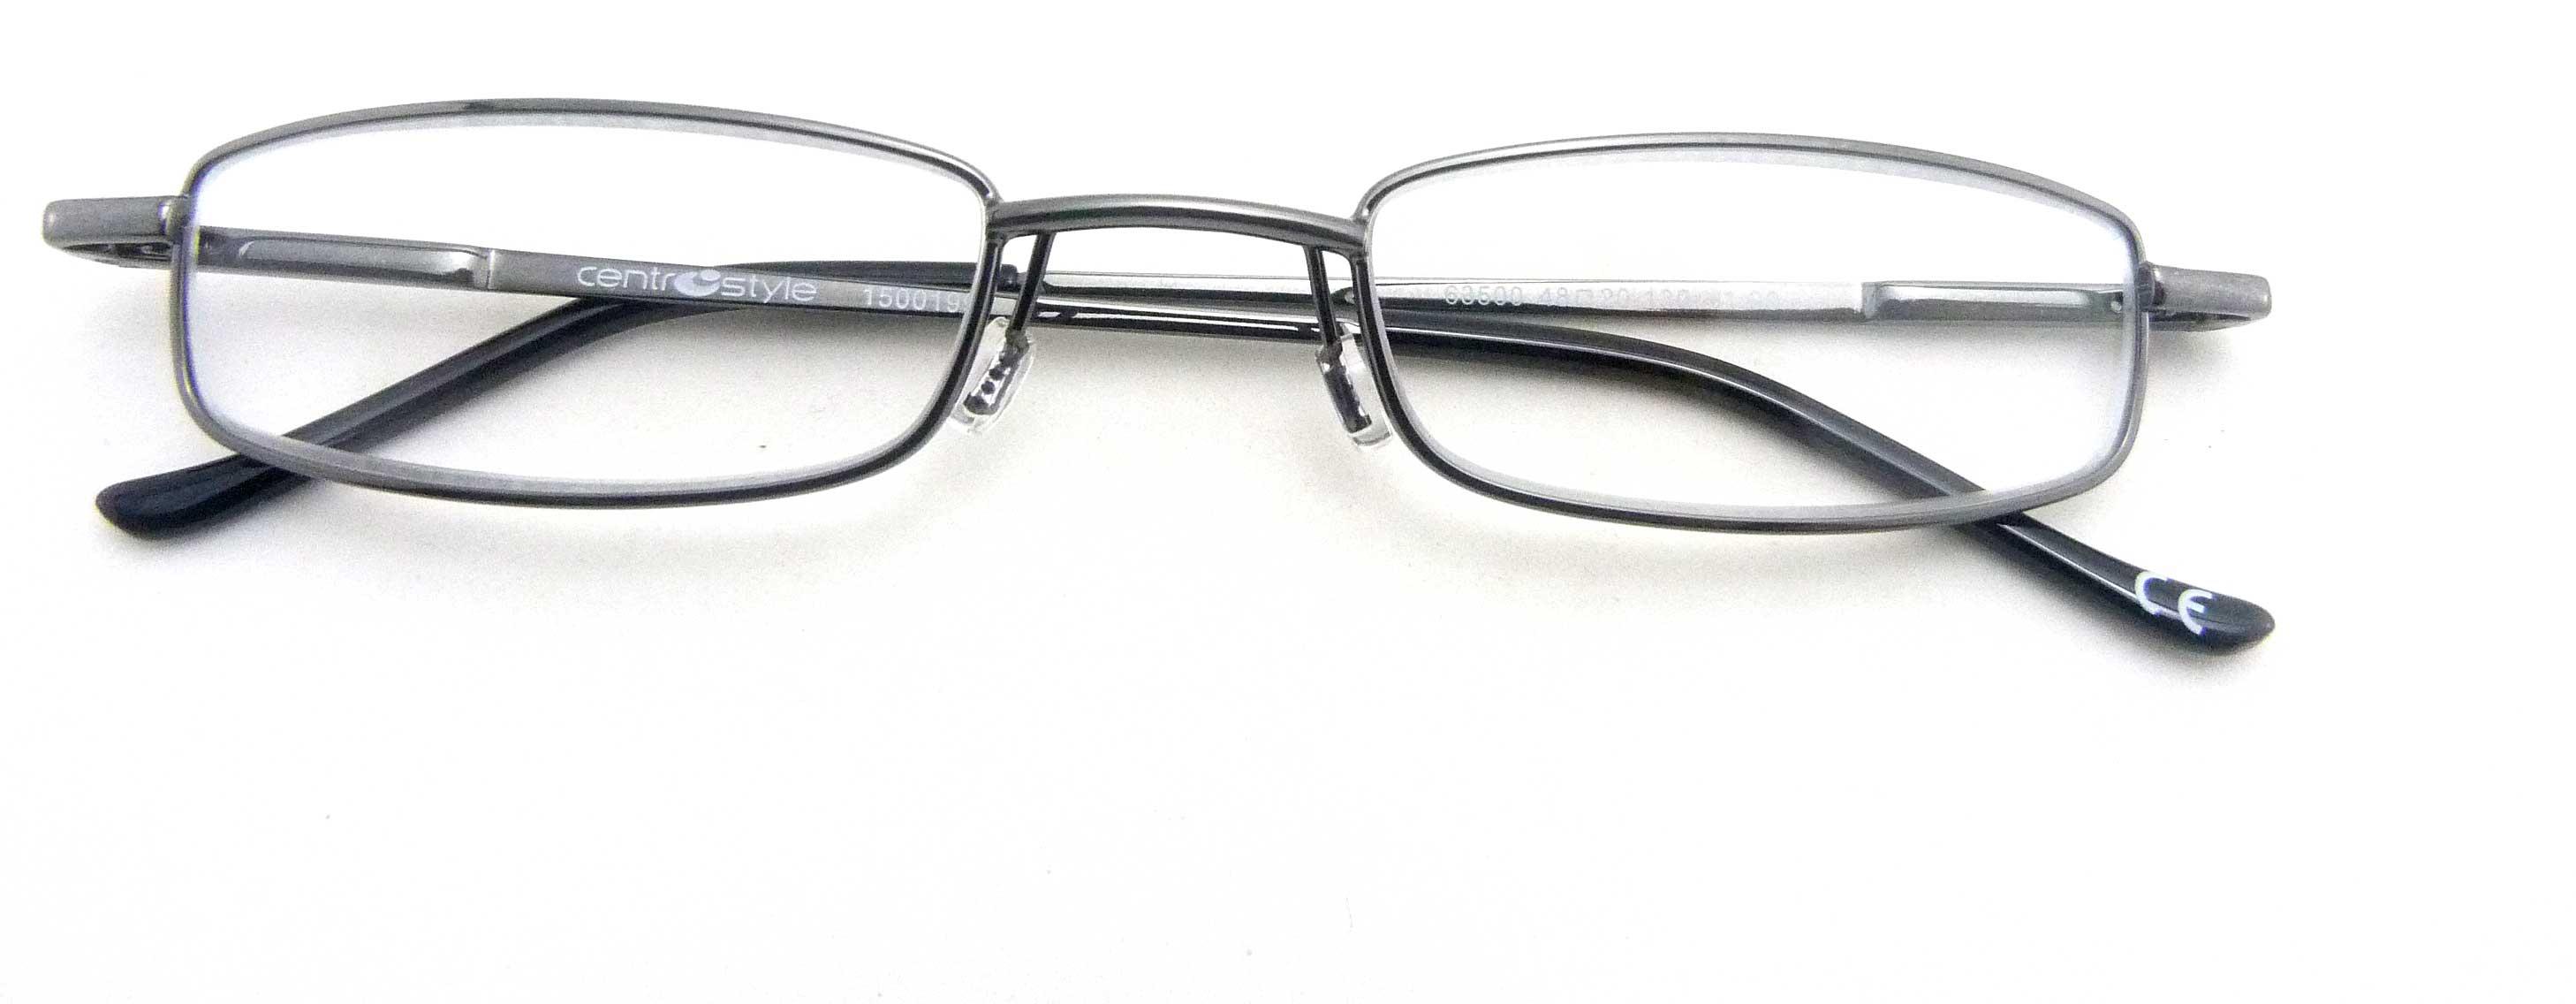 0263502 - Óculos Leitura Flex AT +1,50 GunMetal Mod 63502  -Contém 1 Peça